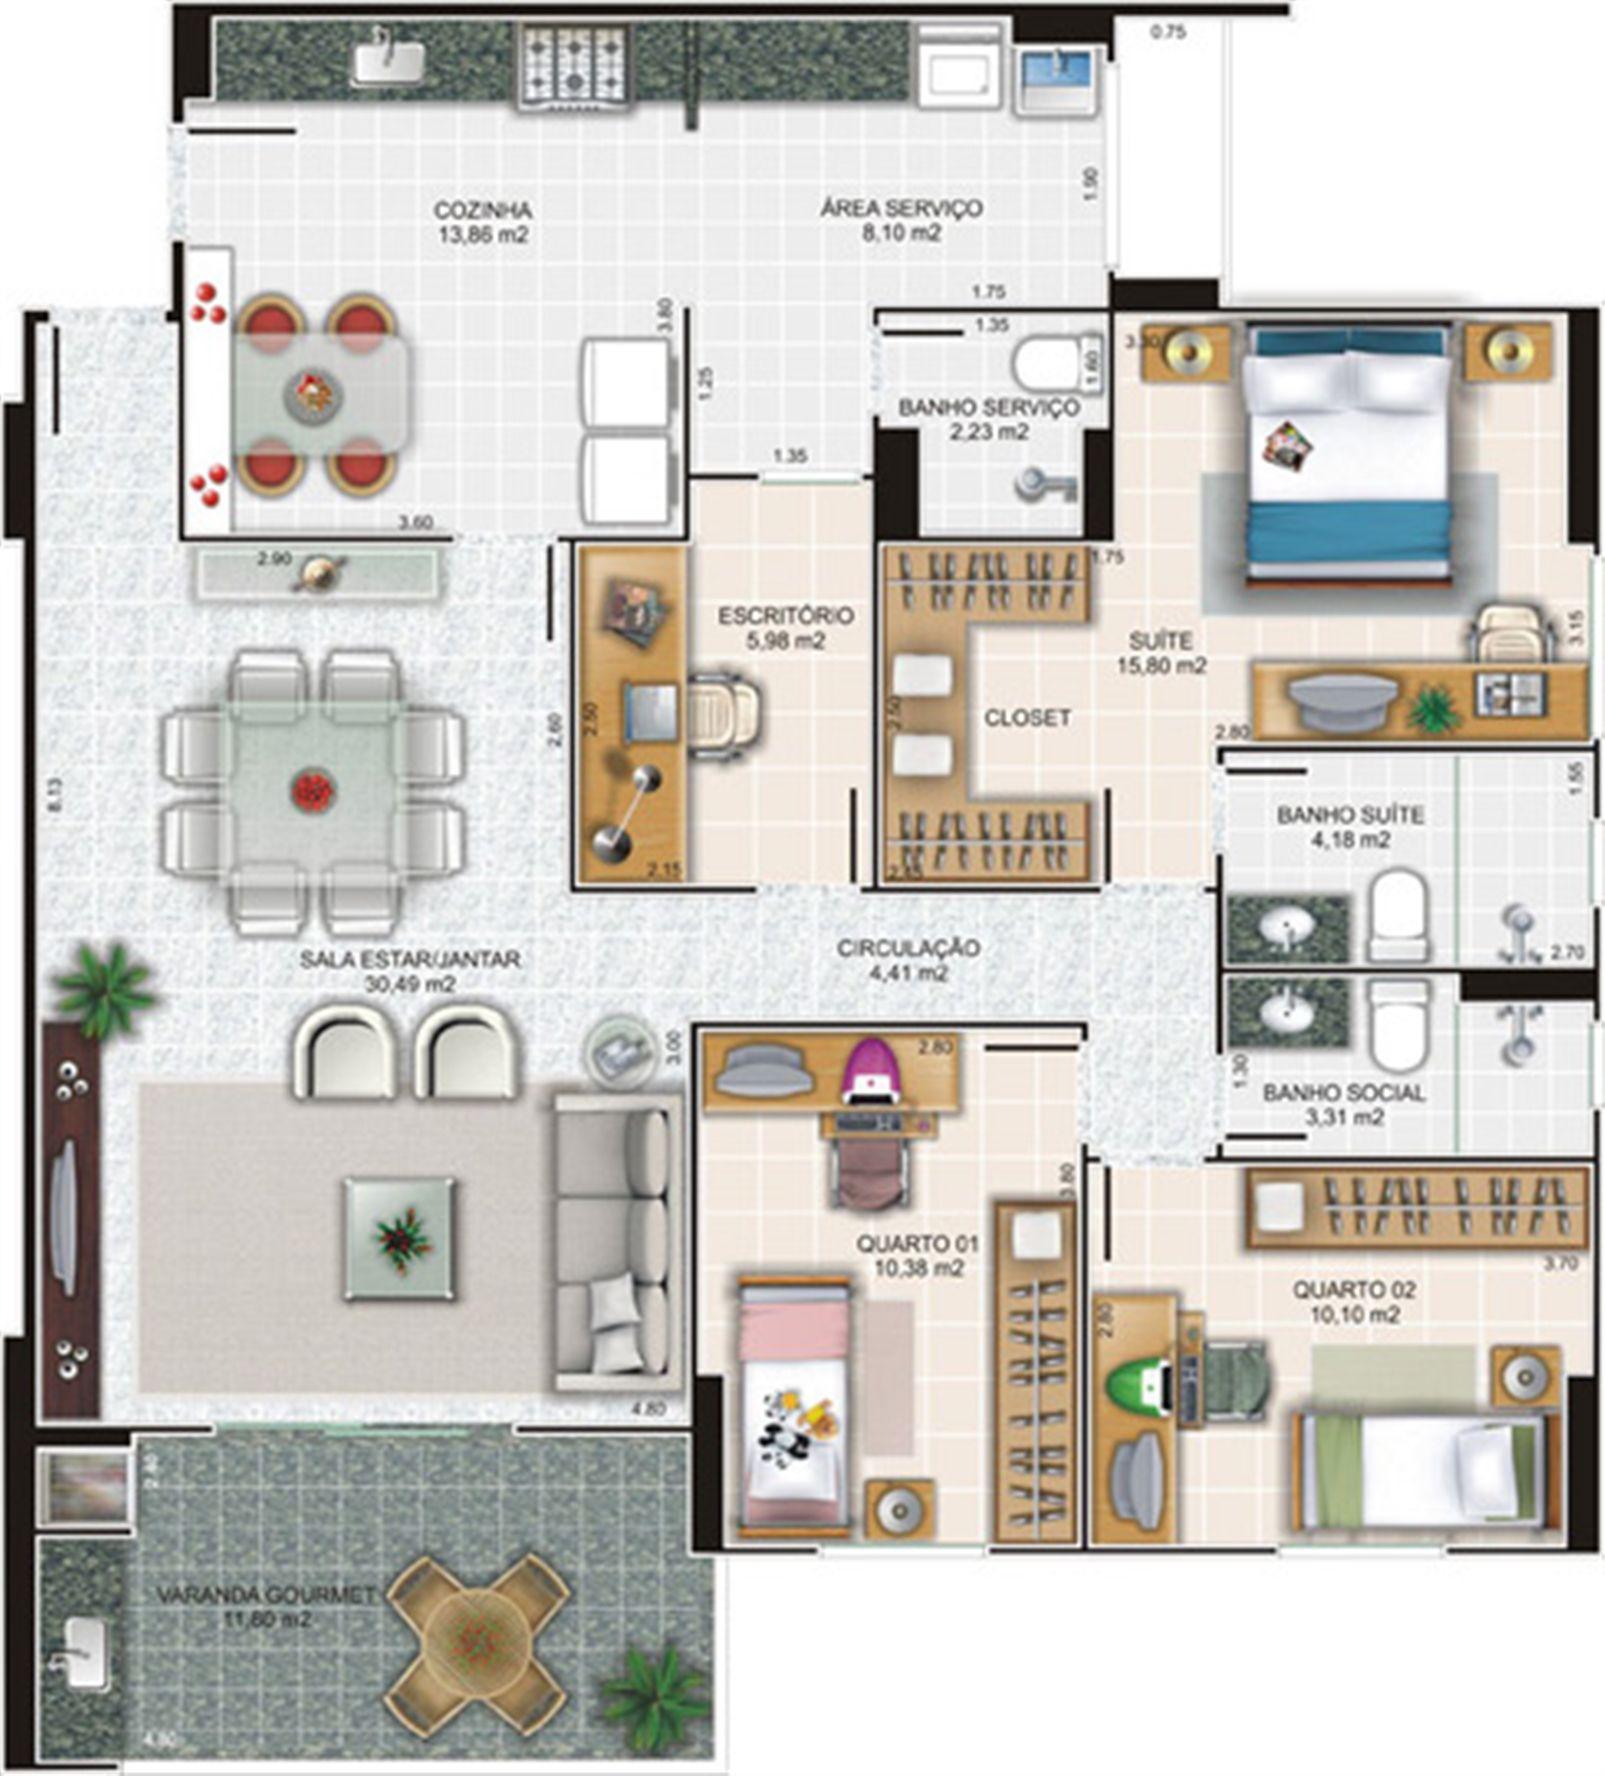 Planta apartamento 3 | Edifício Caiobás – Apartamentoem  Laranjeiras - Serra - Espírito Santo